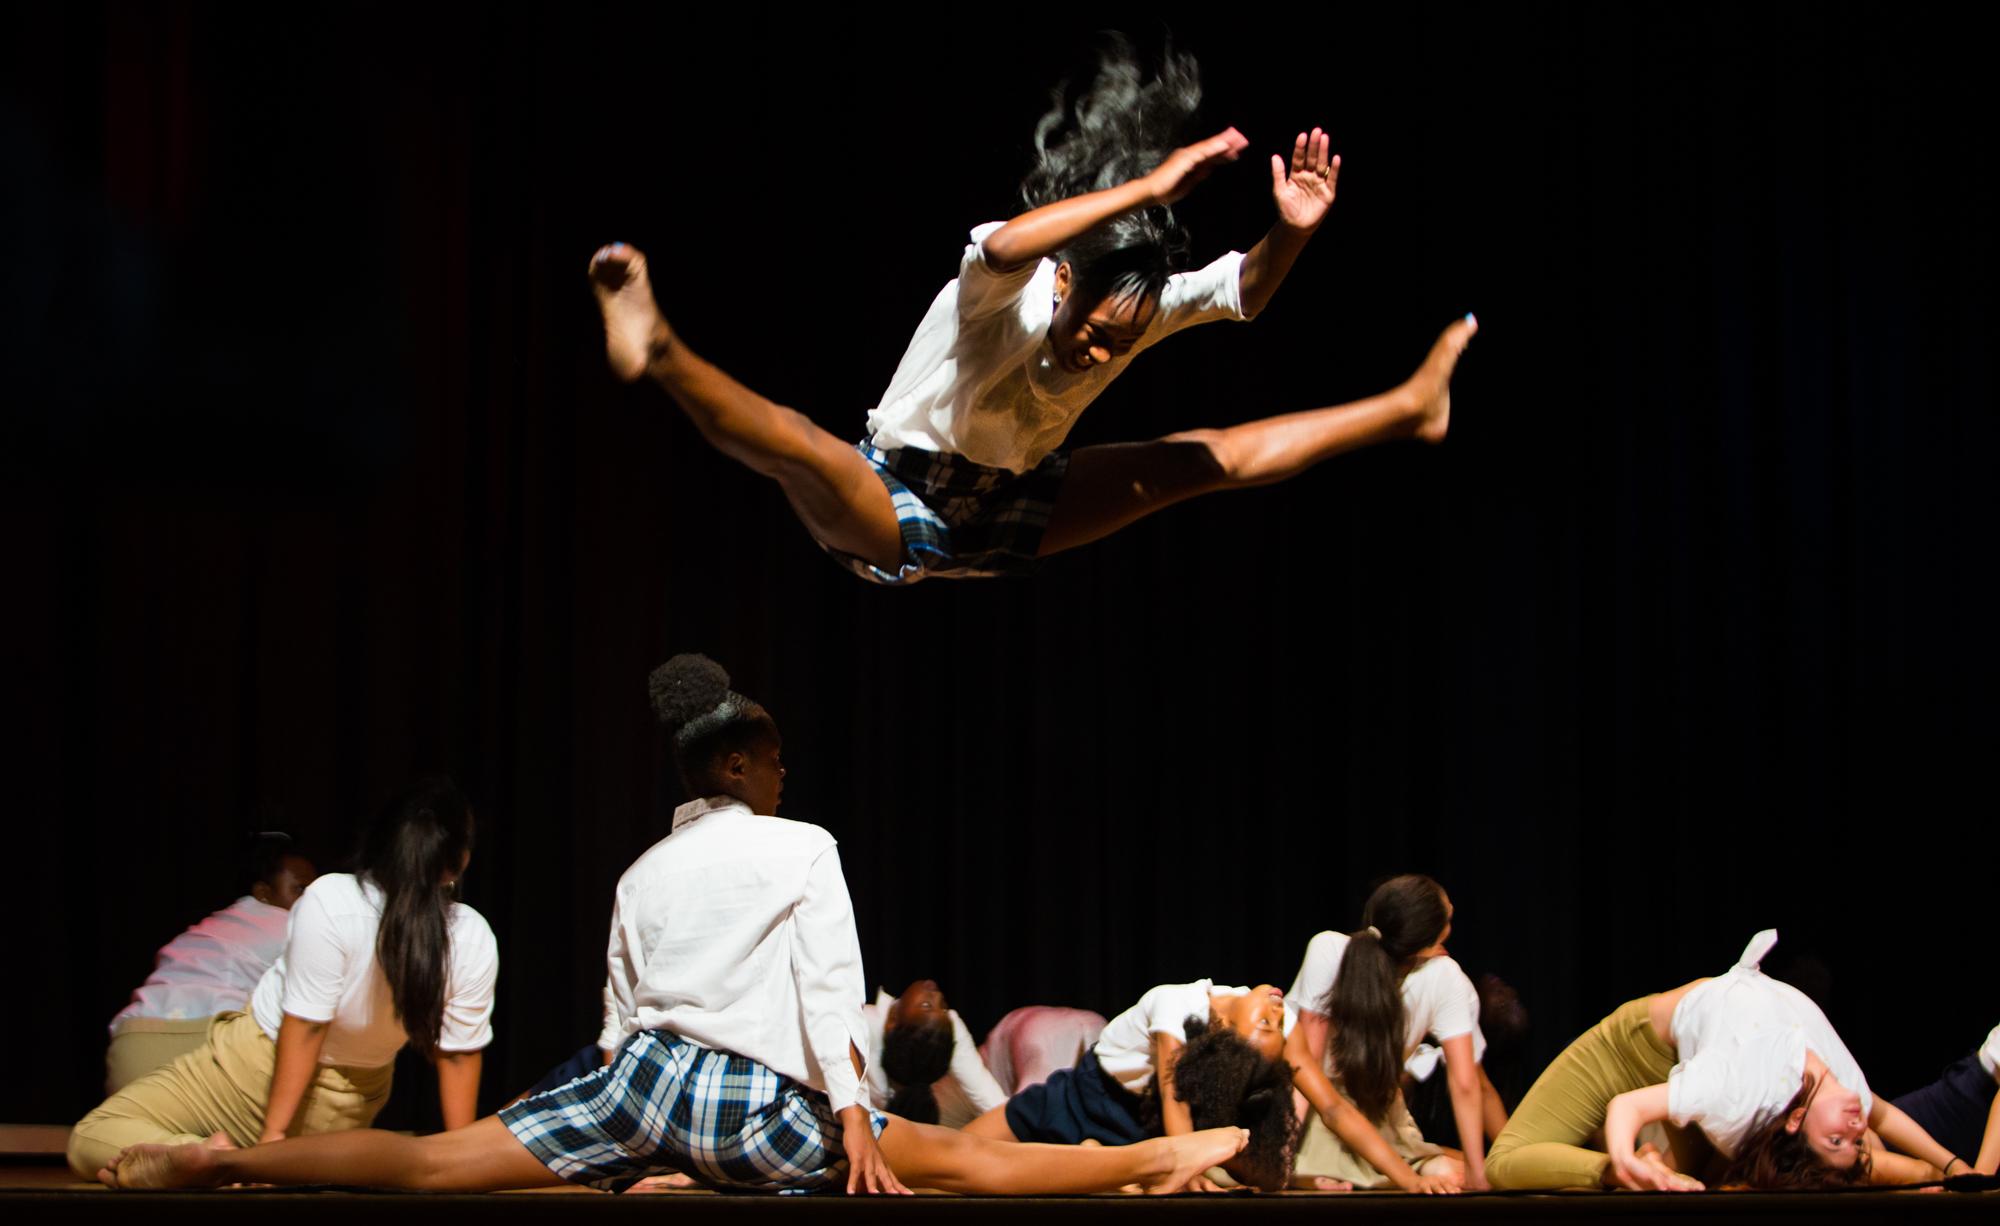 Dorsey High School Performance, Los Angeles   Photographed for CAP (Community Arts Partnership)